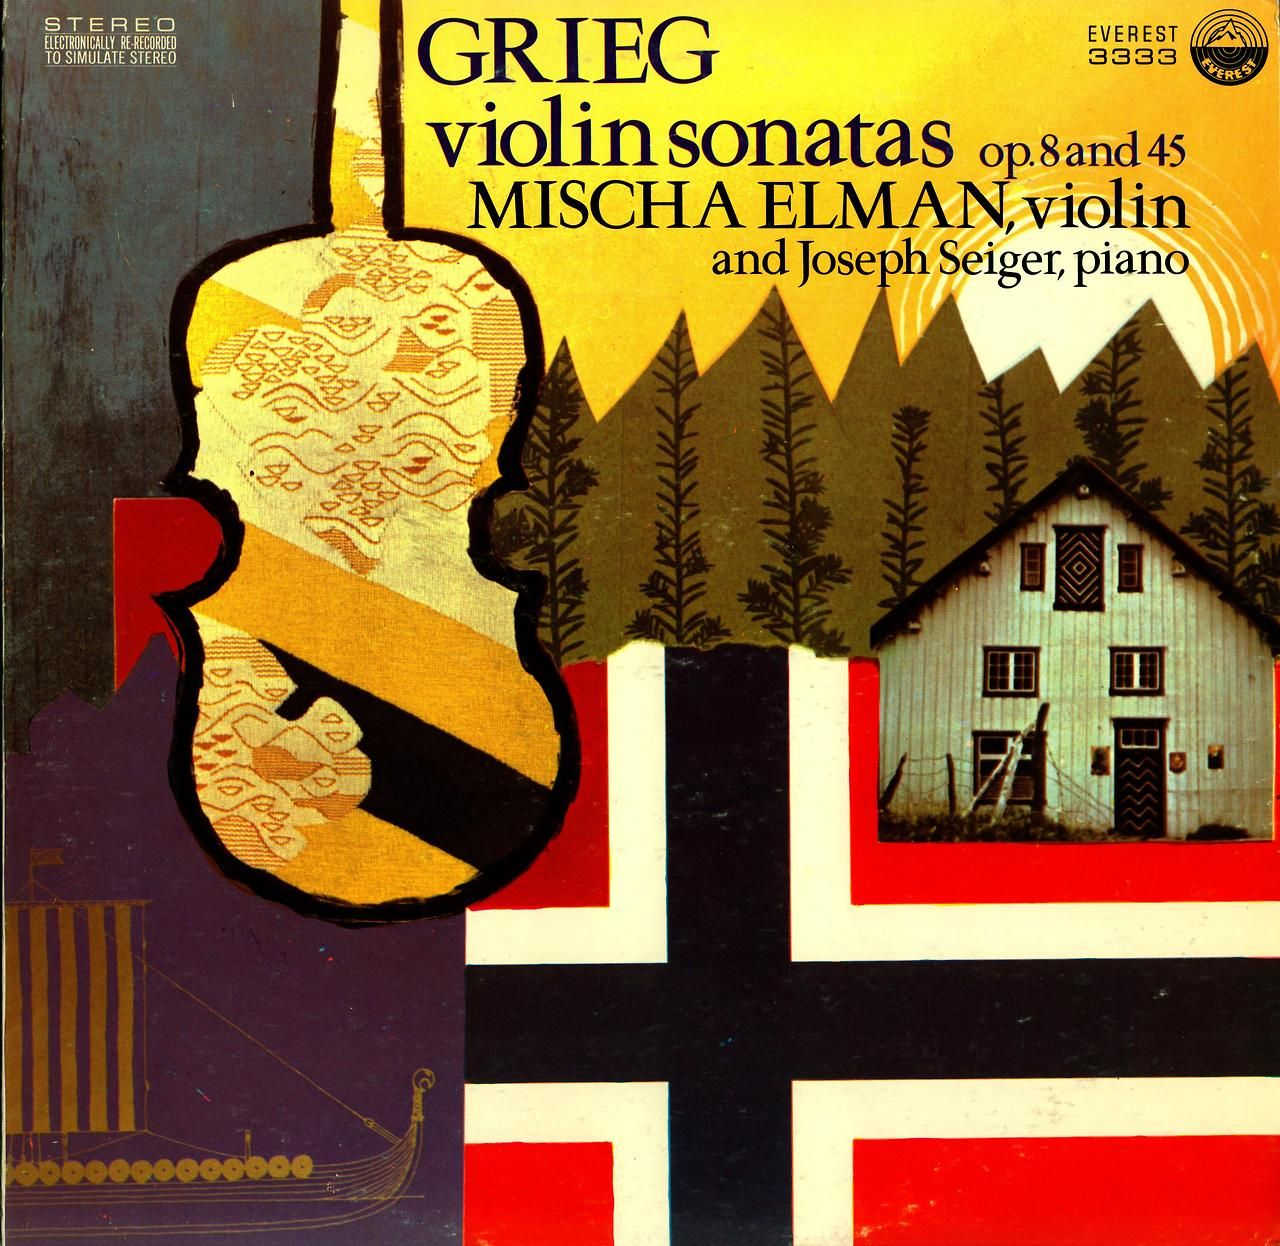 Grieg- Violin Sonatas Mischa Elman, violin:Joseph Seiger, piano Everest 3333 (1971)